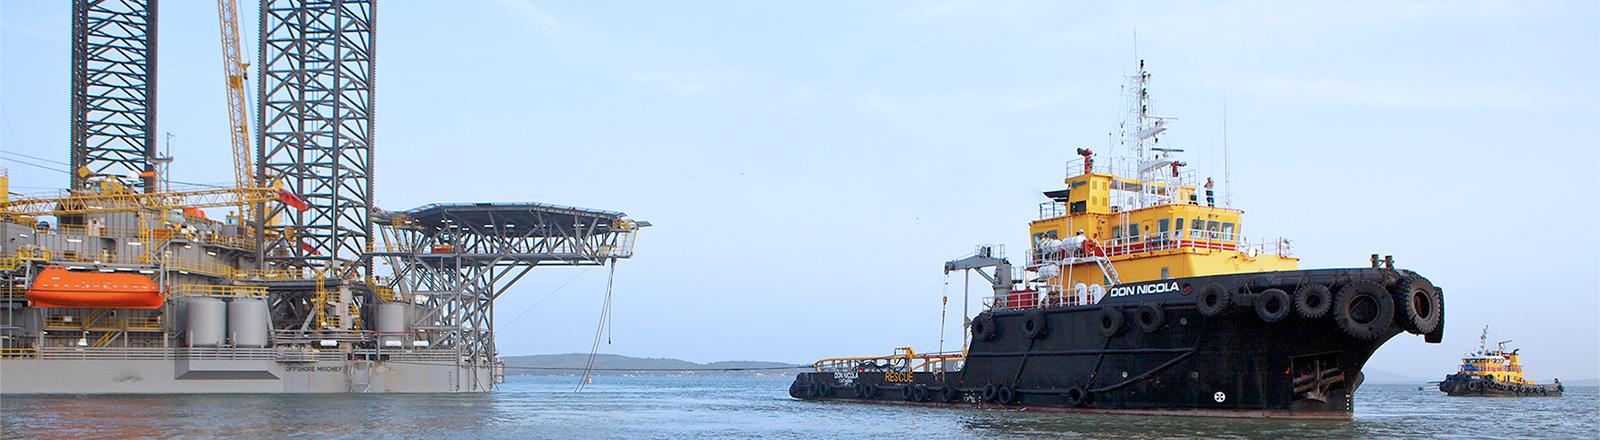 banner-industria-offshore